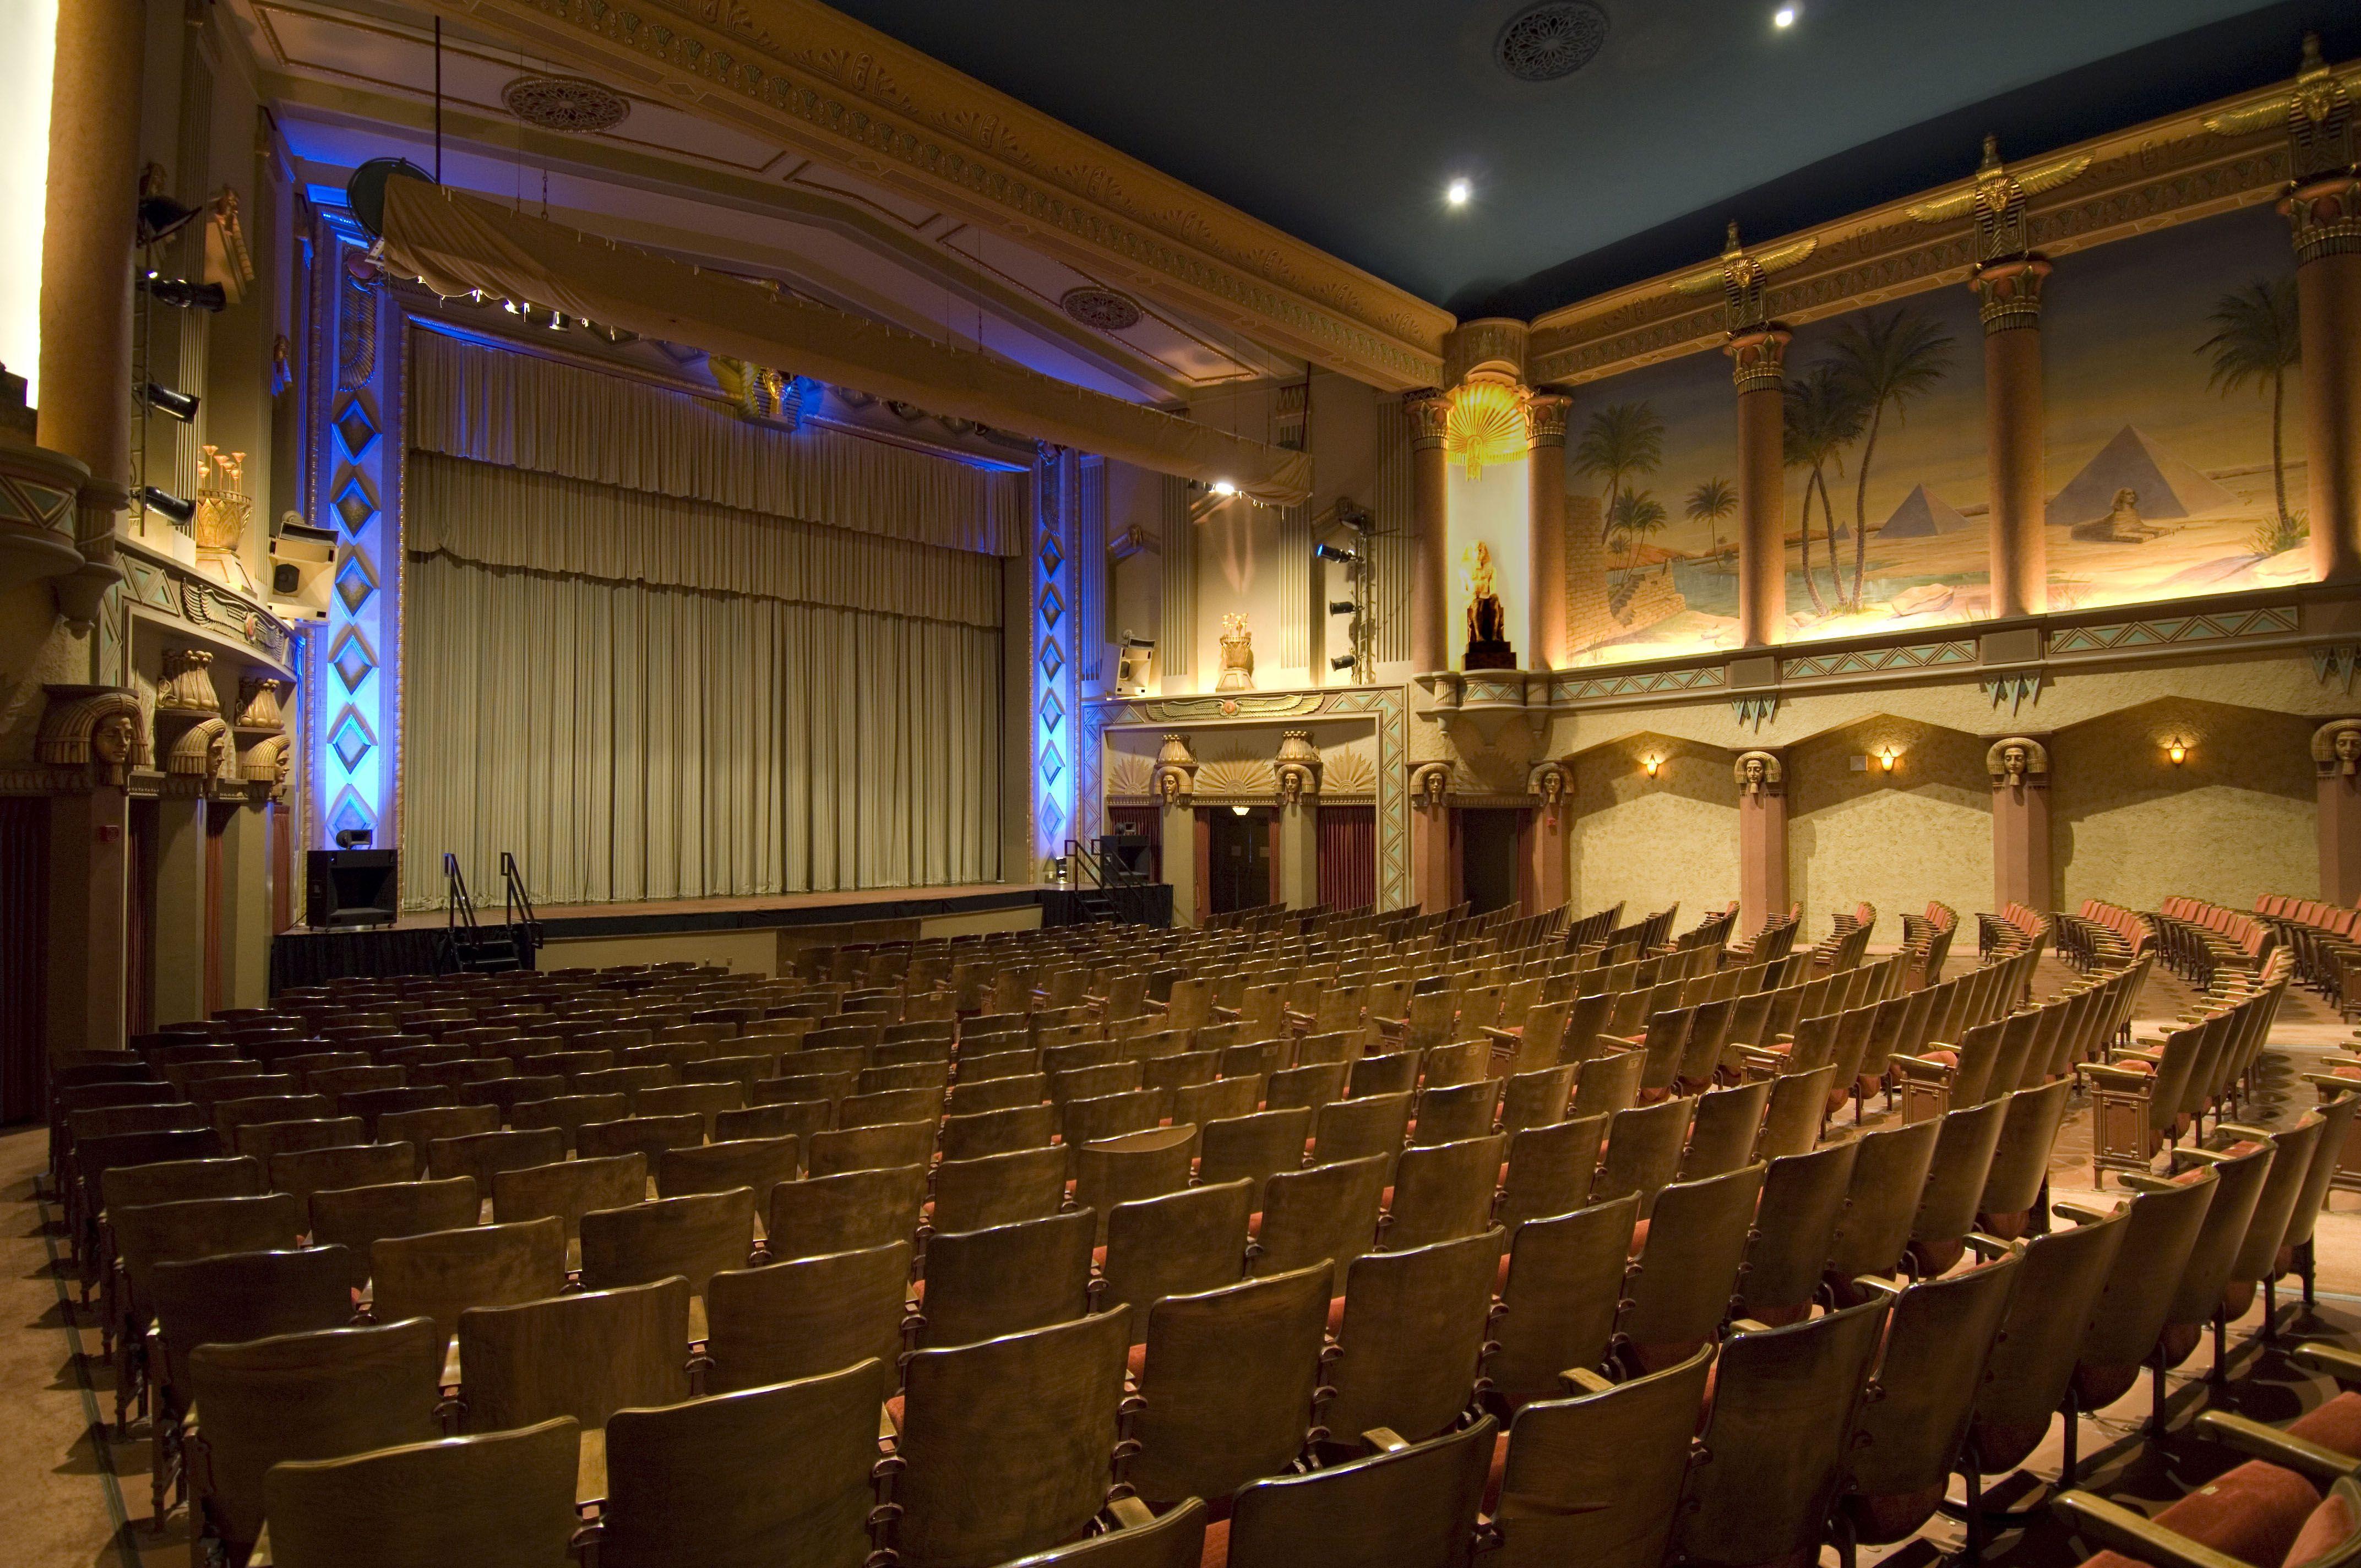 Egyptian Theatre 135 North Second Street, DeKalb IL The ...